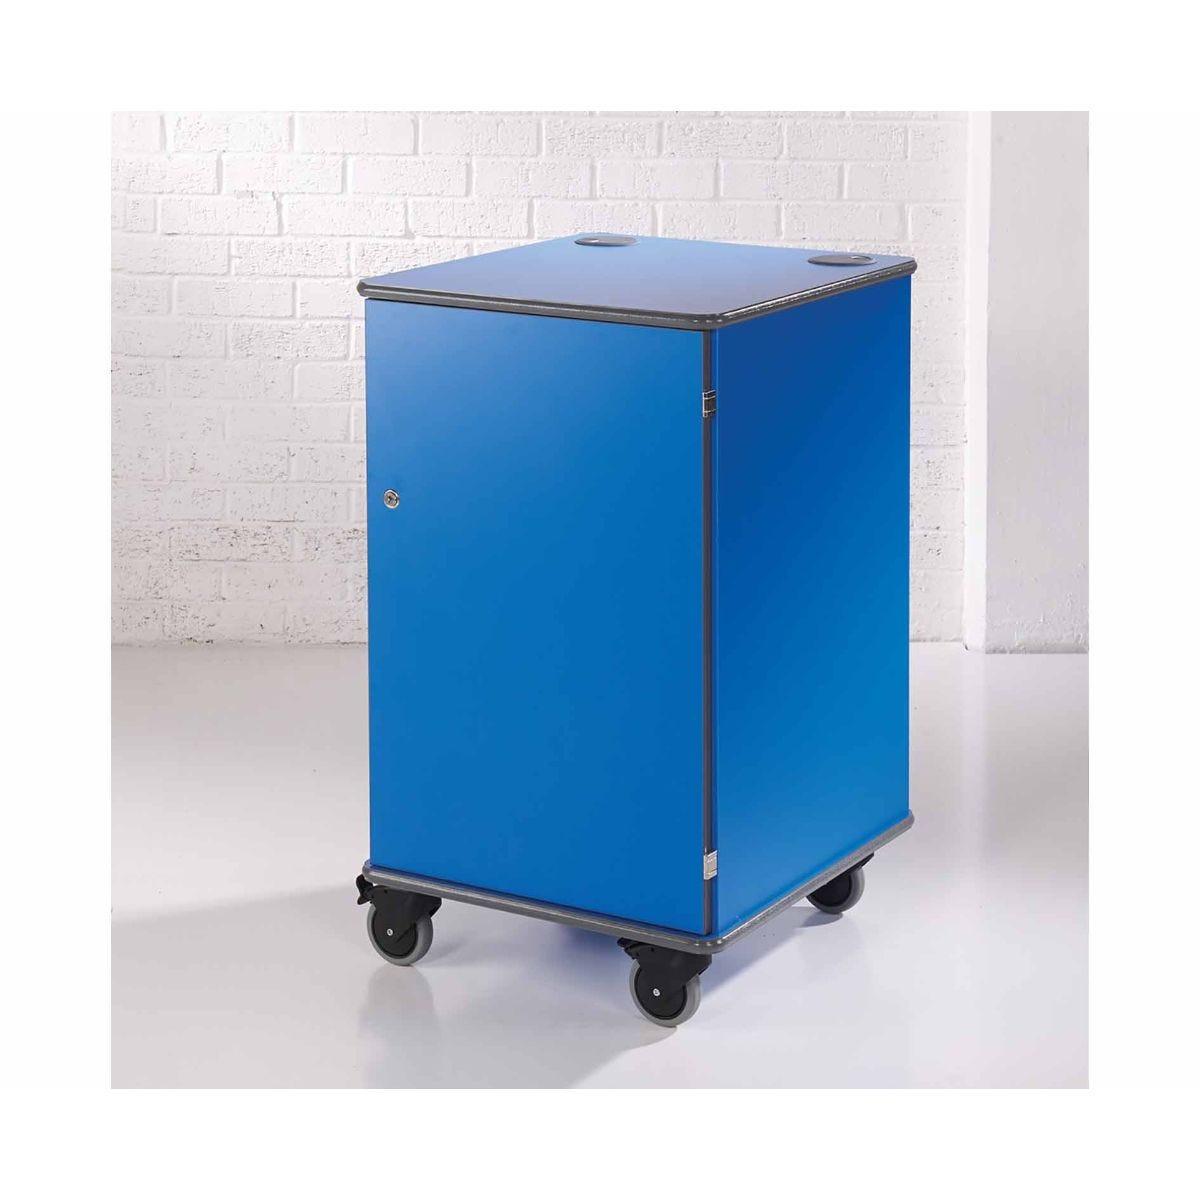 Metroplan Multi-Media Projector Cabinet, Blue